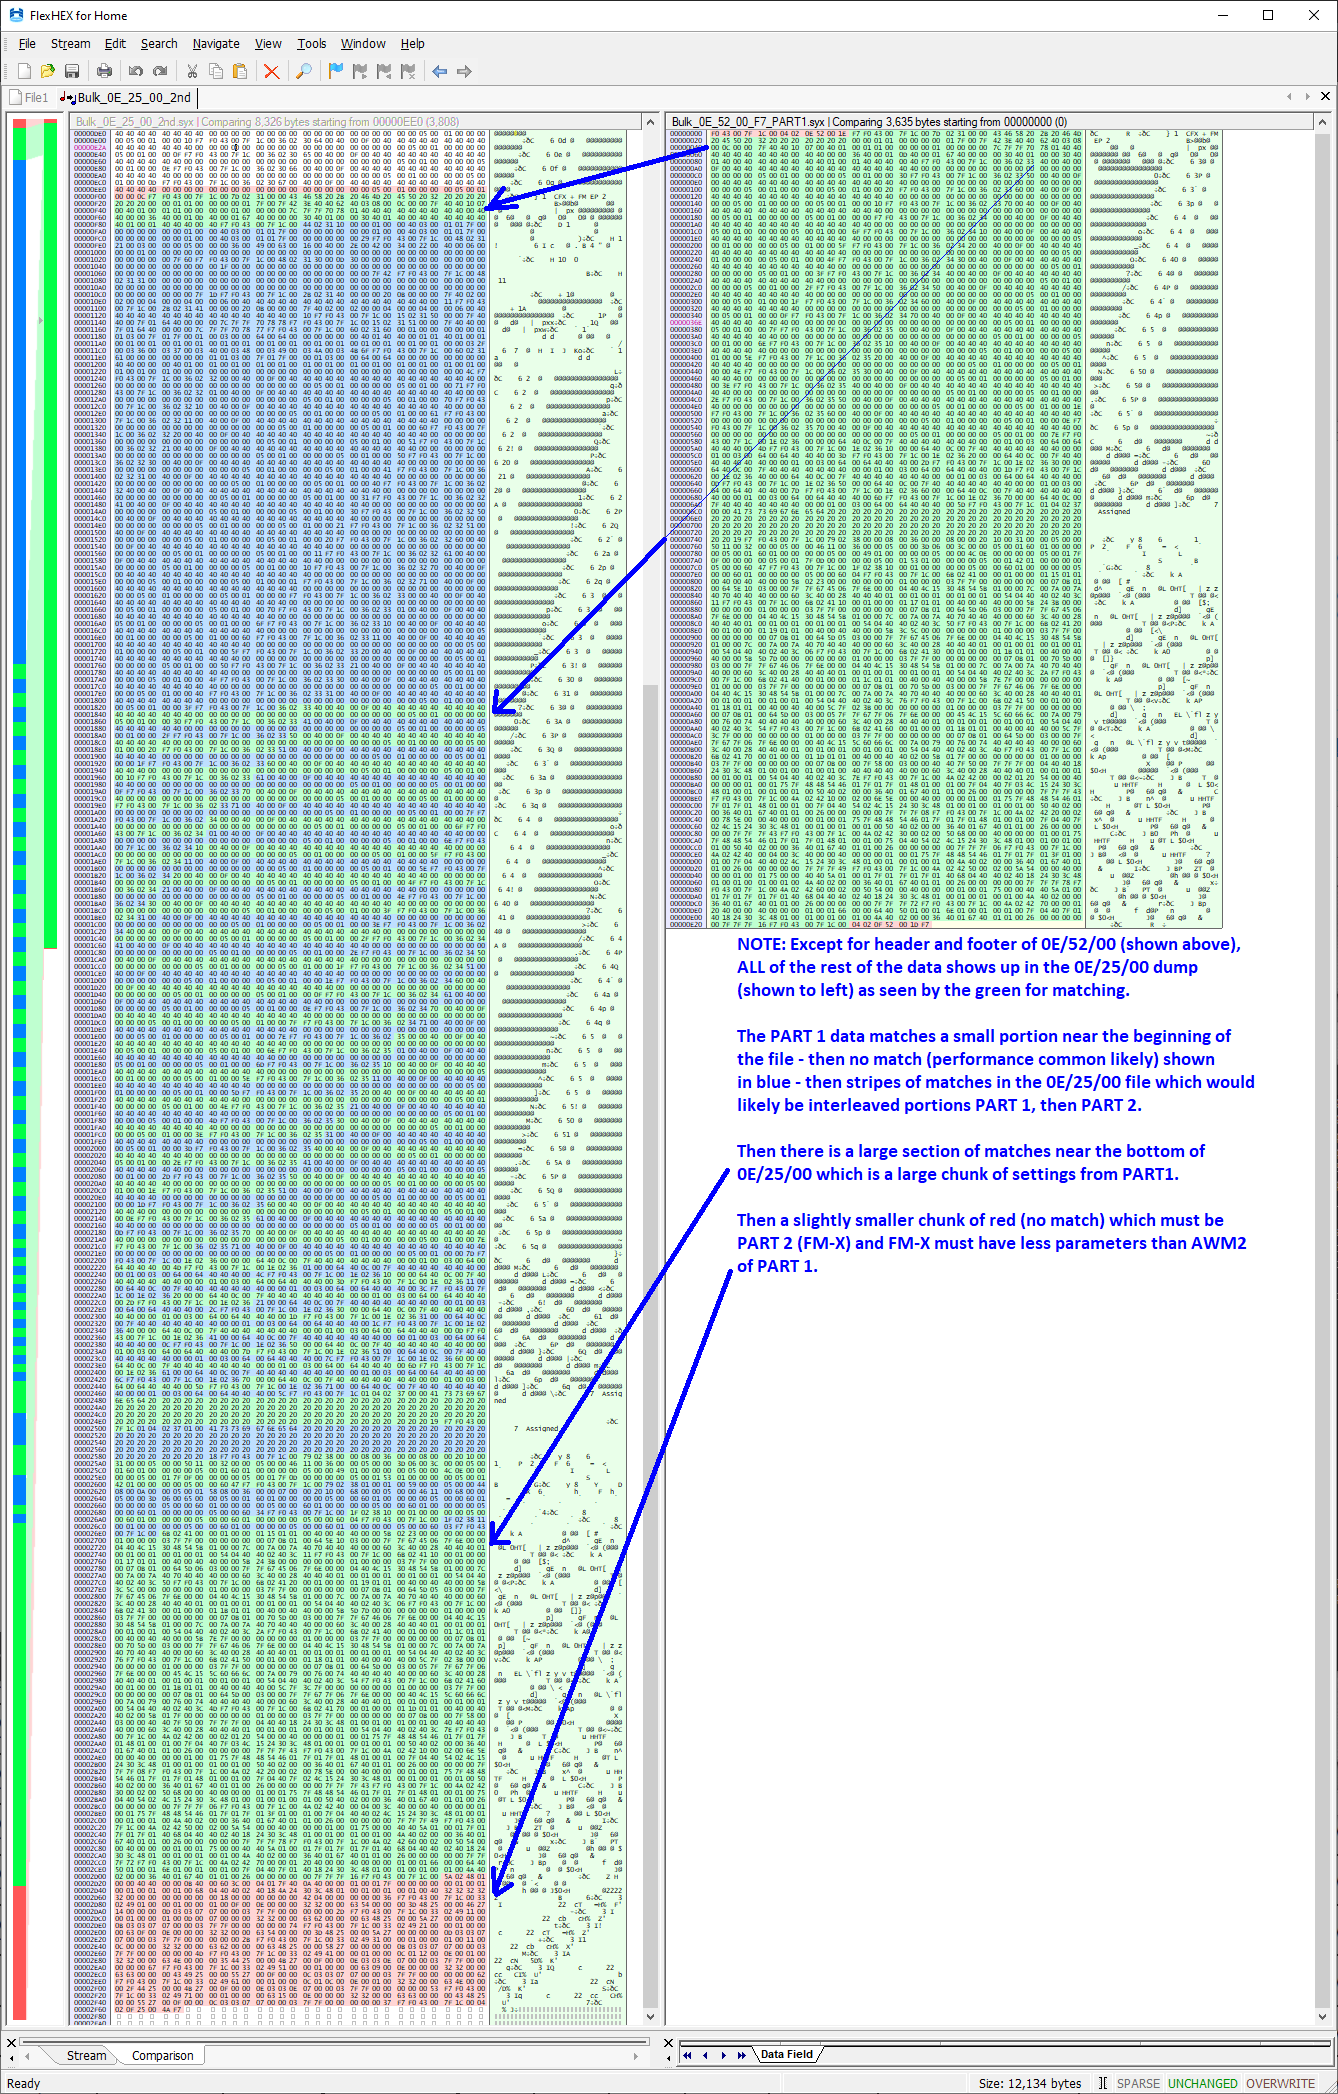 https://i.ibb.co/vHrzZTQ/Bulk-Dump-Compares-Montage-Fixed.png